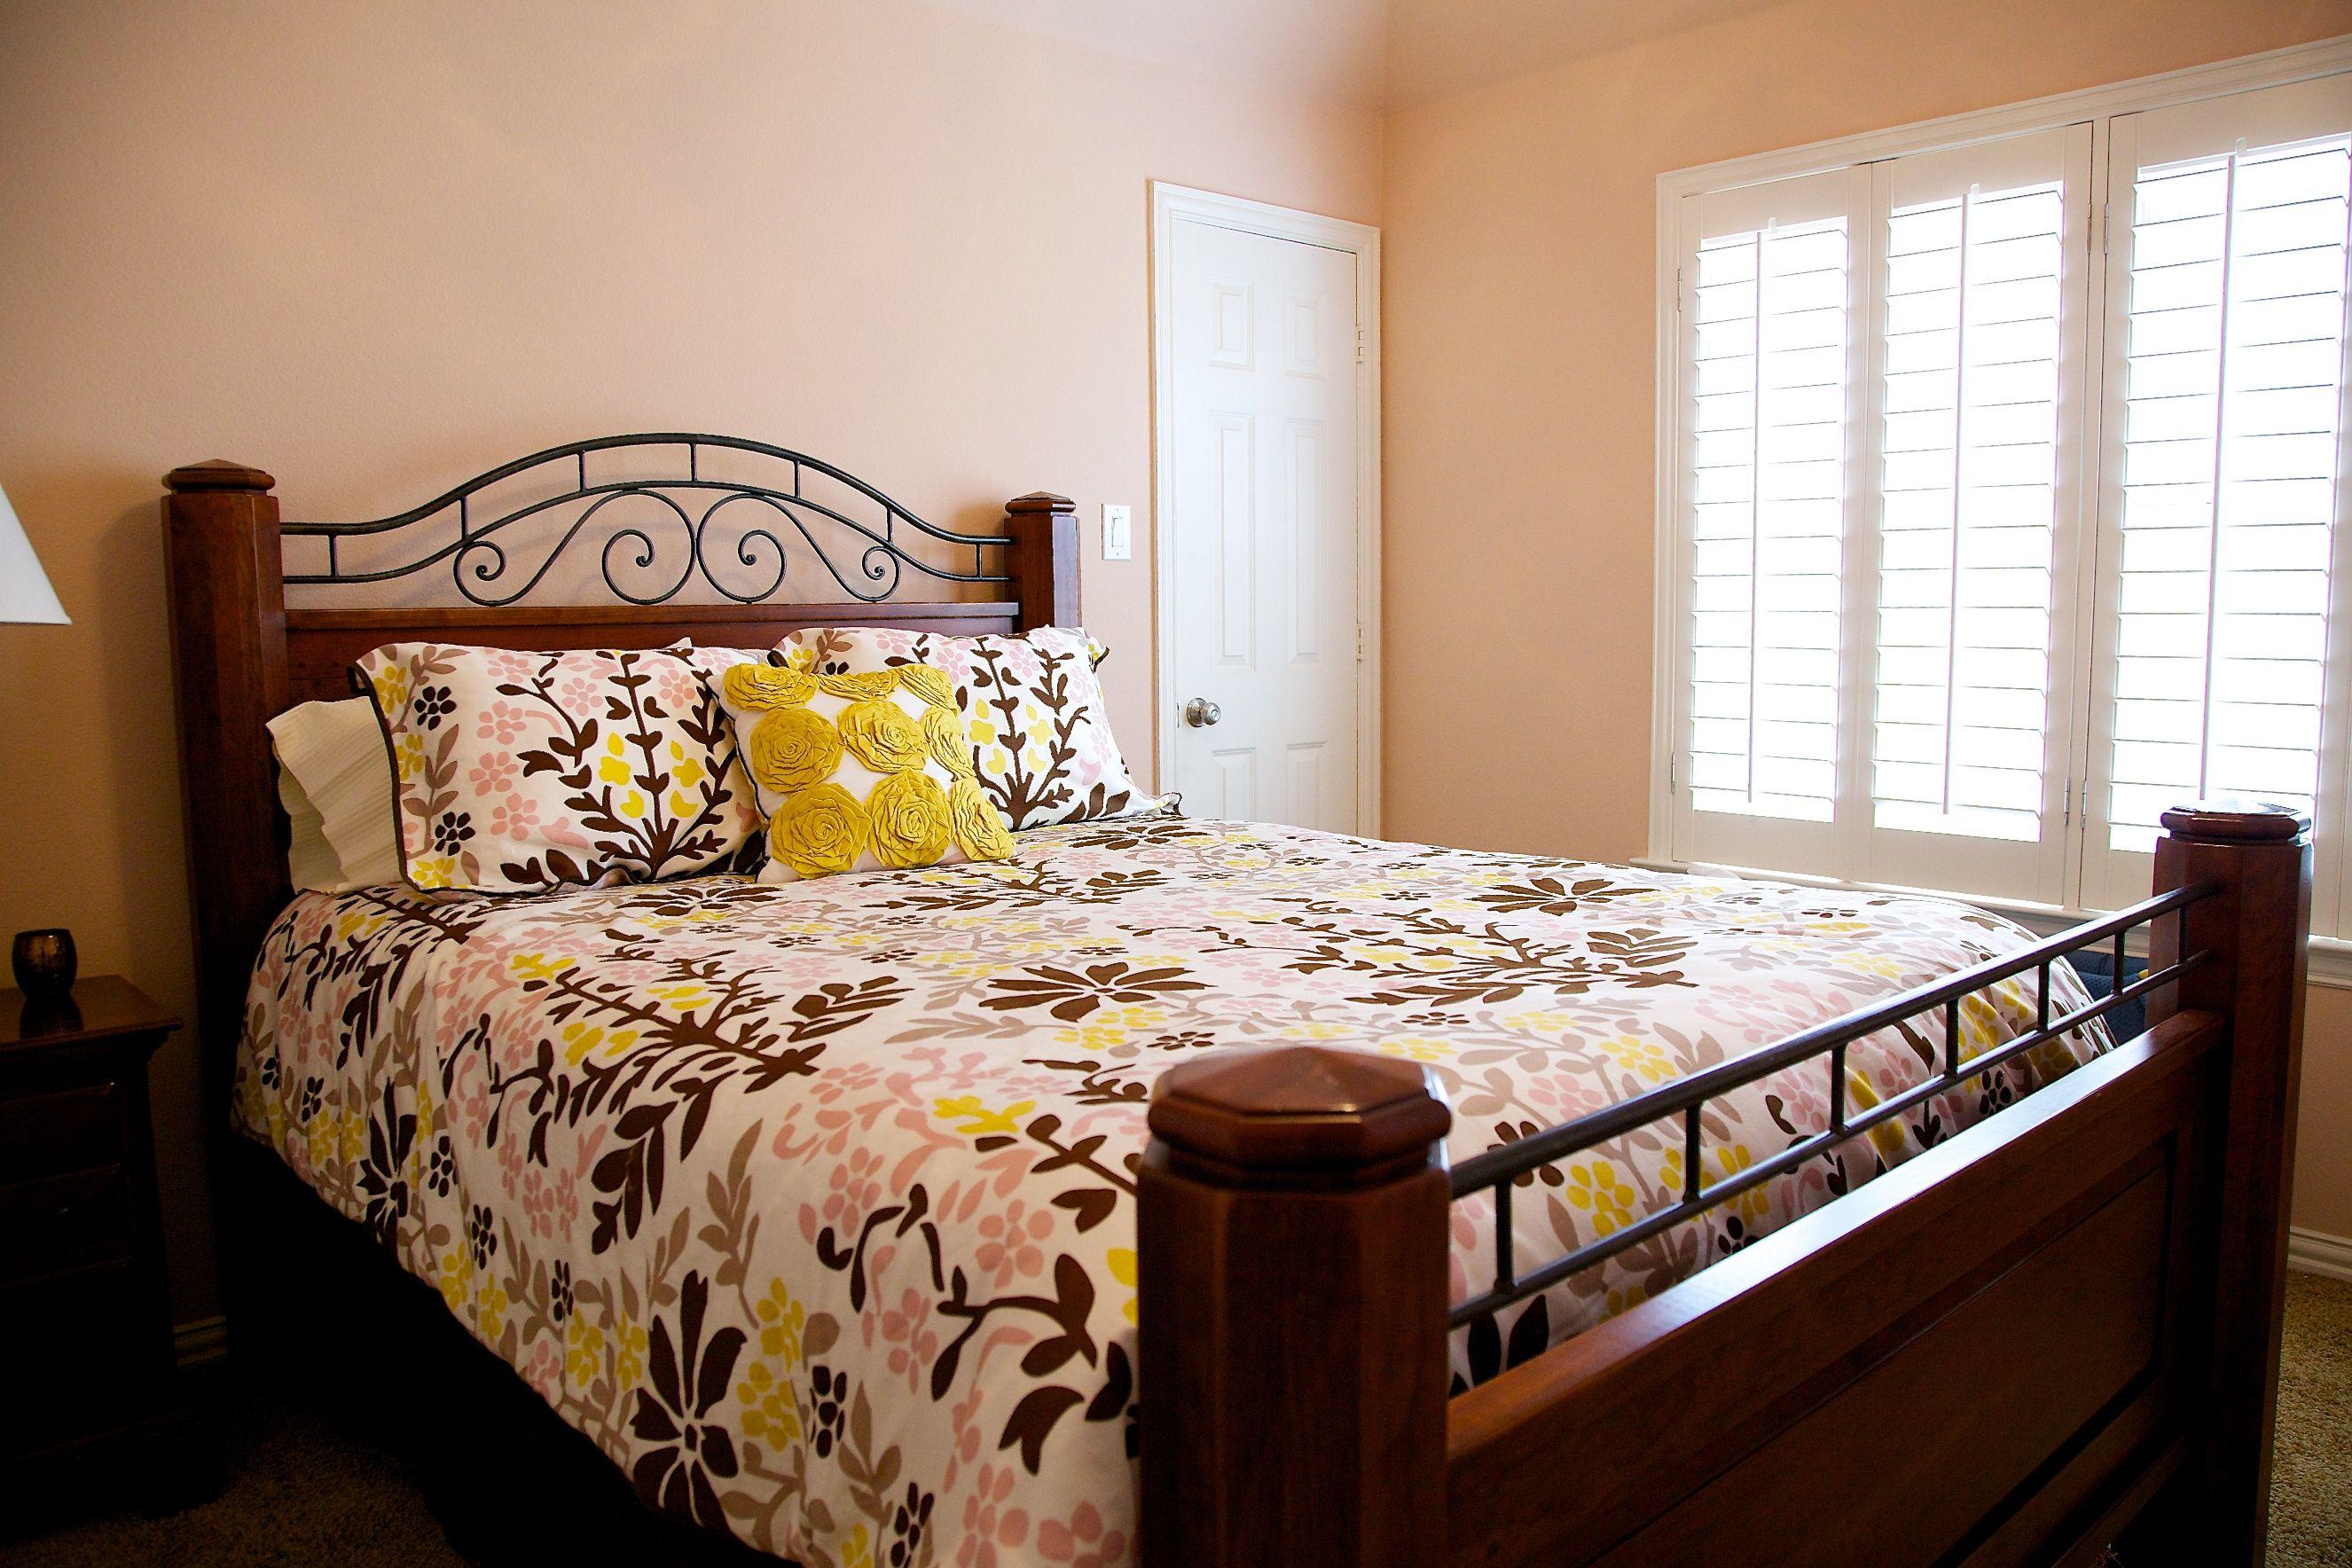 Benjamin moore georgetown pink beige hc 56 love this - Beige paint colors for living room ...